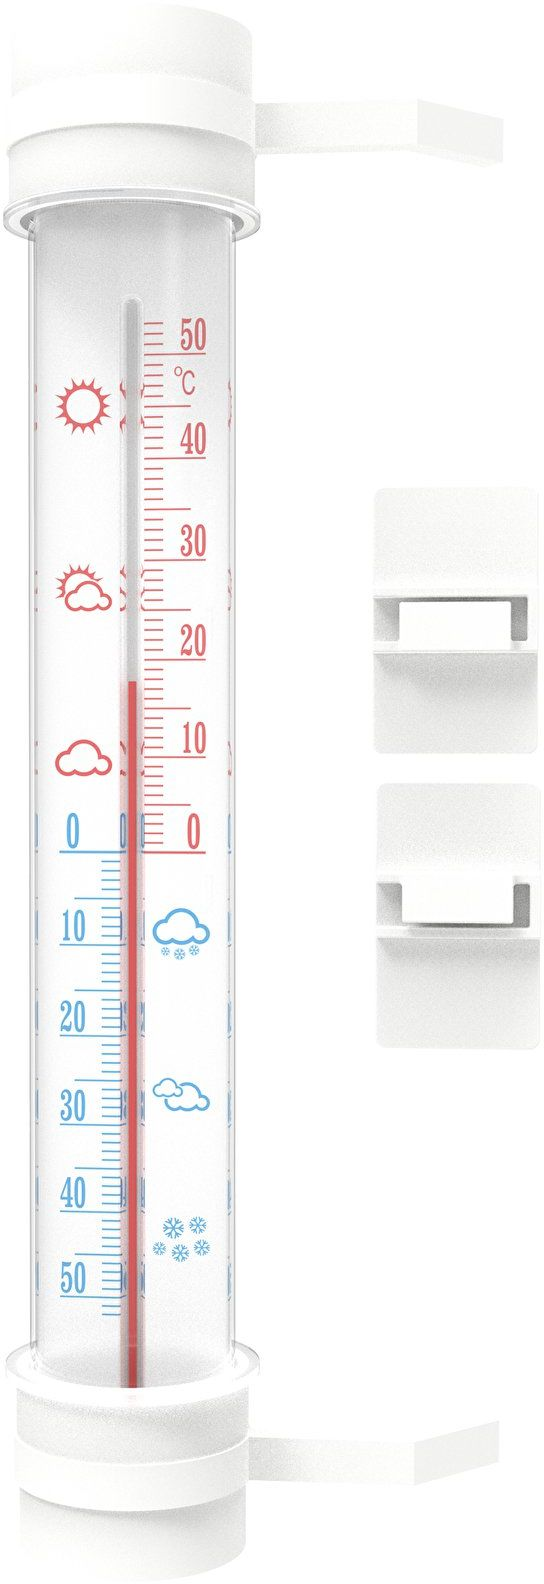 Termometr zewnętrzny - kpl. 900 szt.